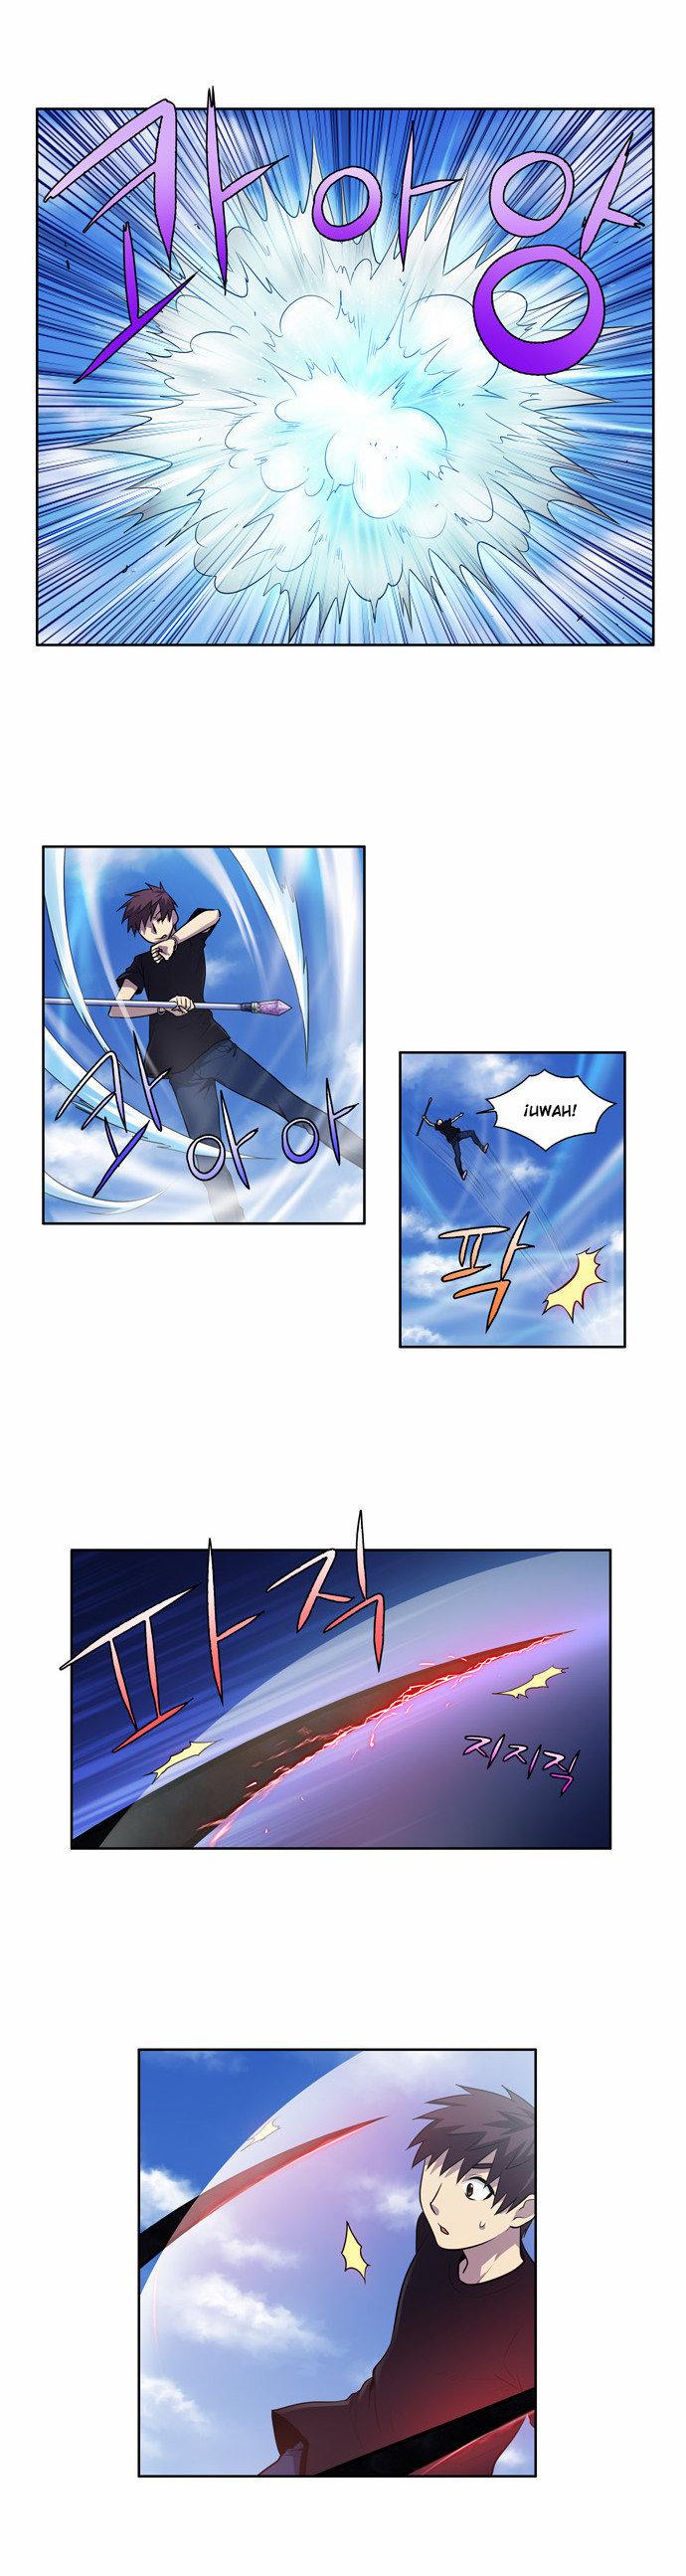 http://c5.ninemanga.com/es_manga/61/1725/442376/e3dd863ef4277e82f712a5bd8fefe7d7.jpg Page 10